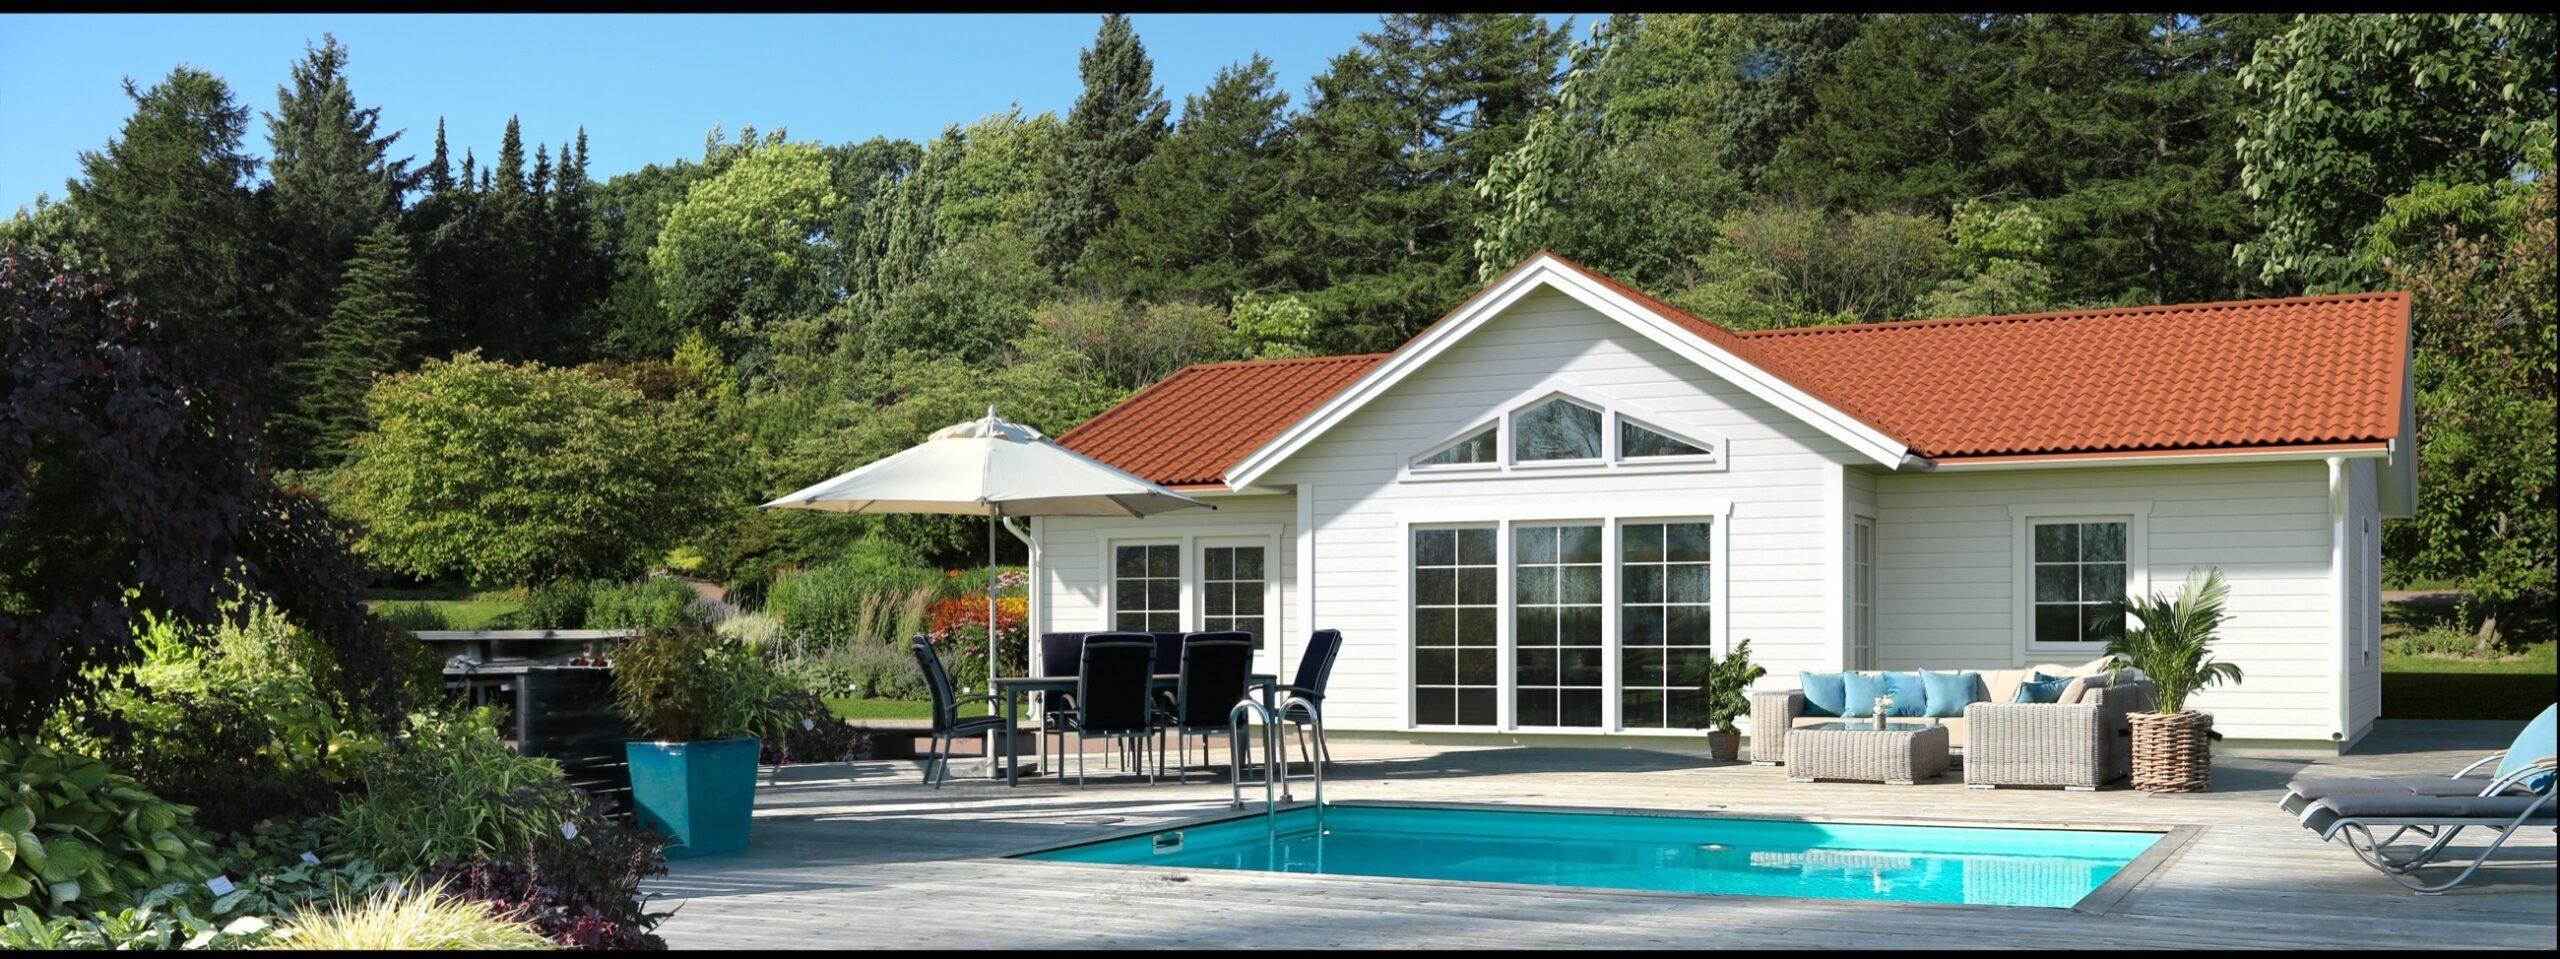 visualisering-exterior-hus-med-pool-laj-illustration